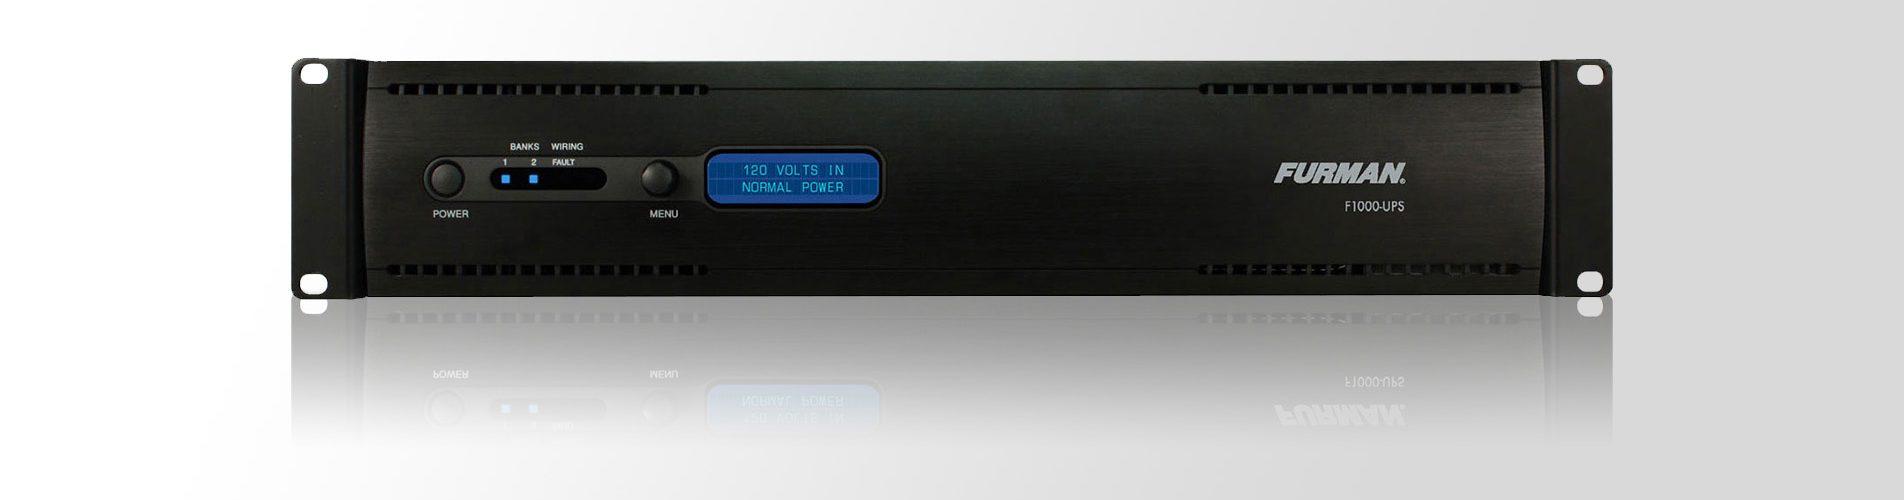 f1000upsbg-1904x500